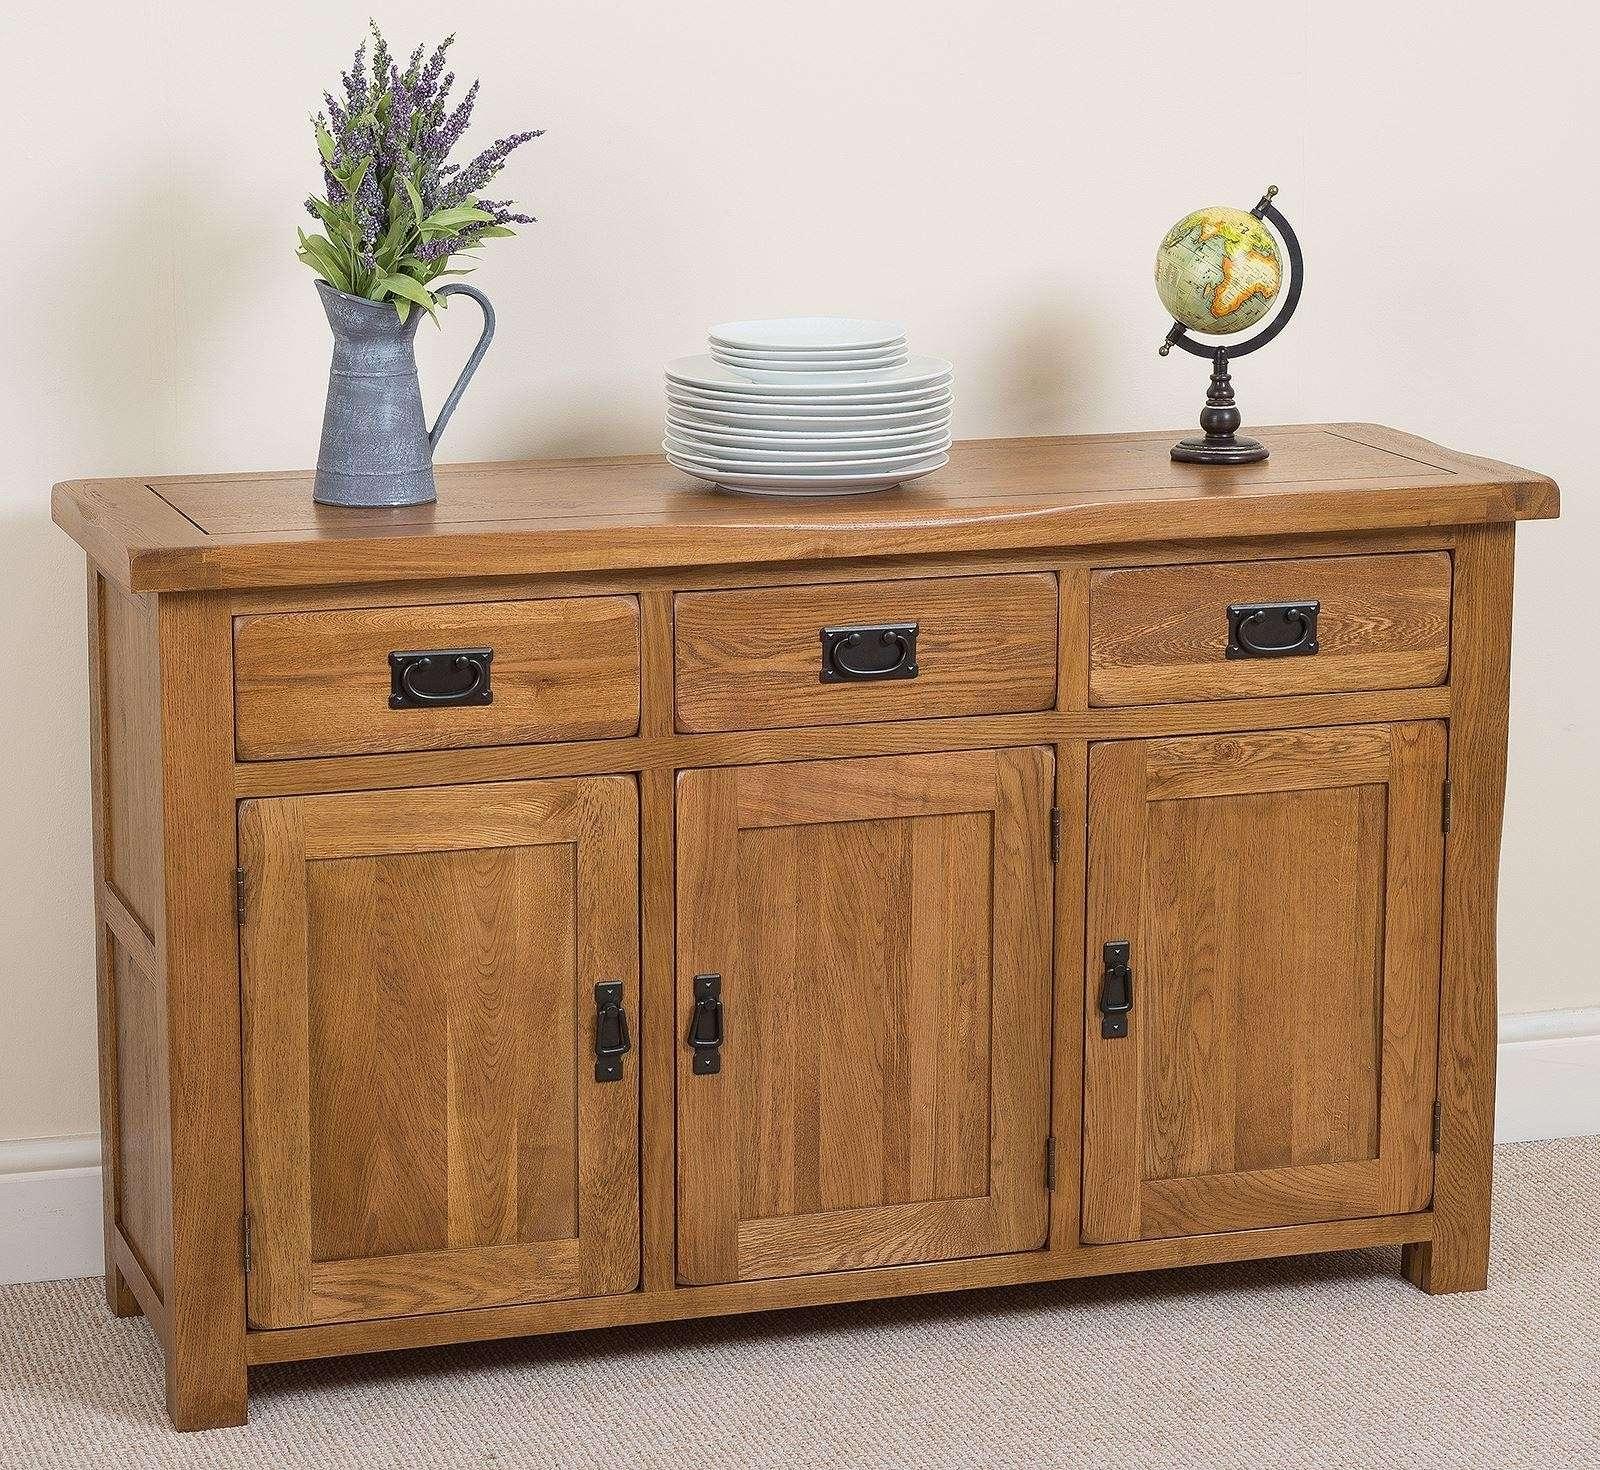 Cotswold Large Oak Sideboard | Free Uk Delivery Regarding Storage Sideboards (View 10 of 20)